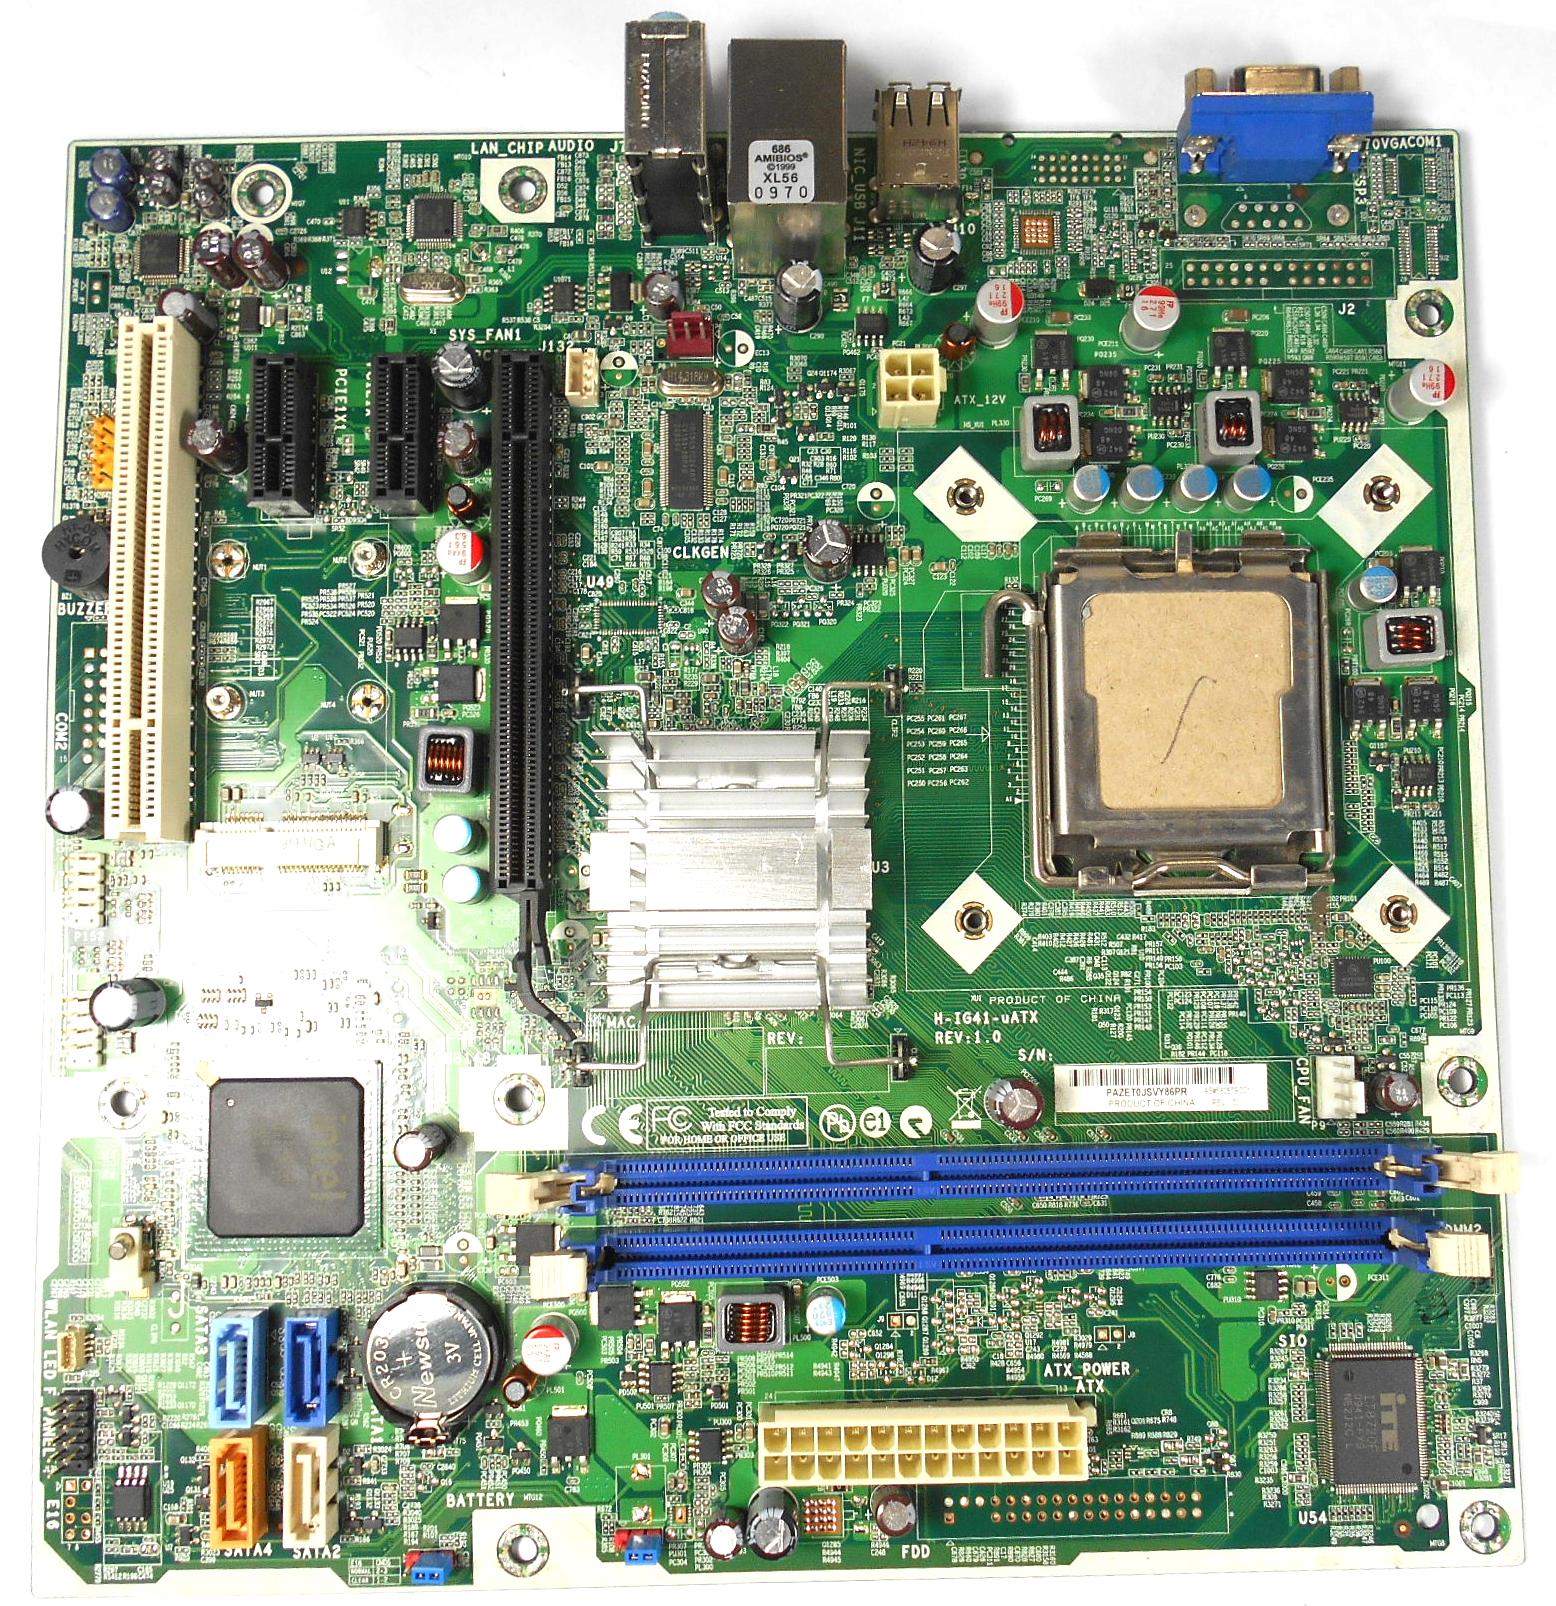 HP 582679-001 H-IG41-uATX Socket 775 Motherboard